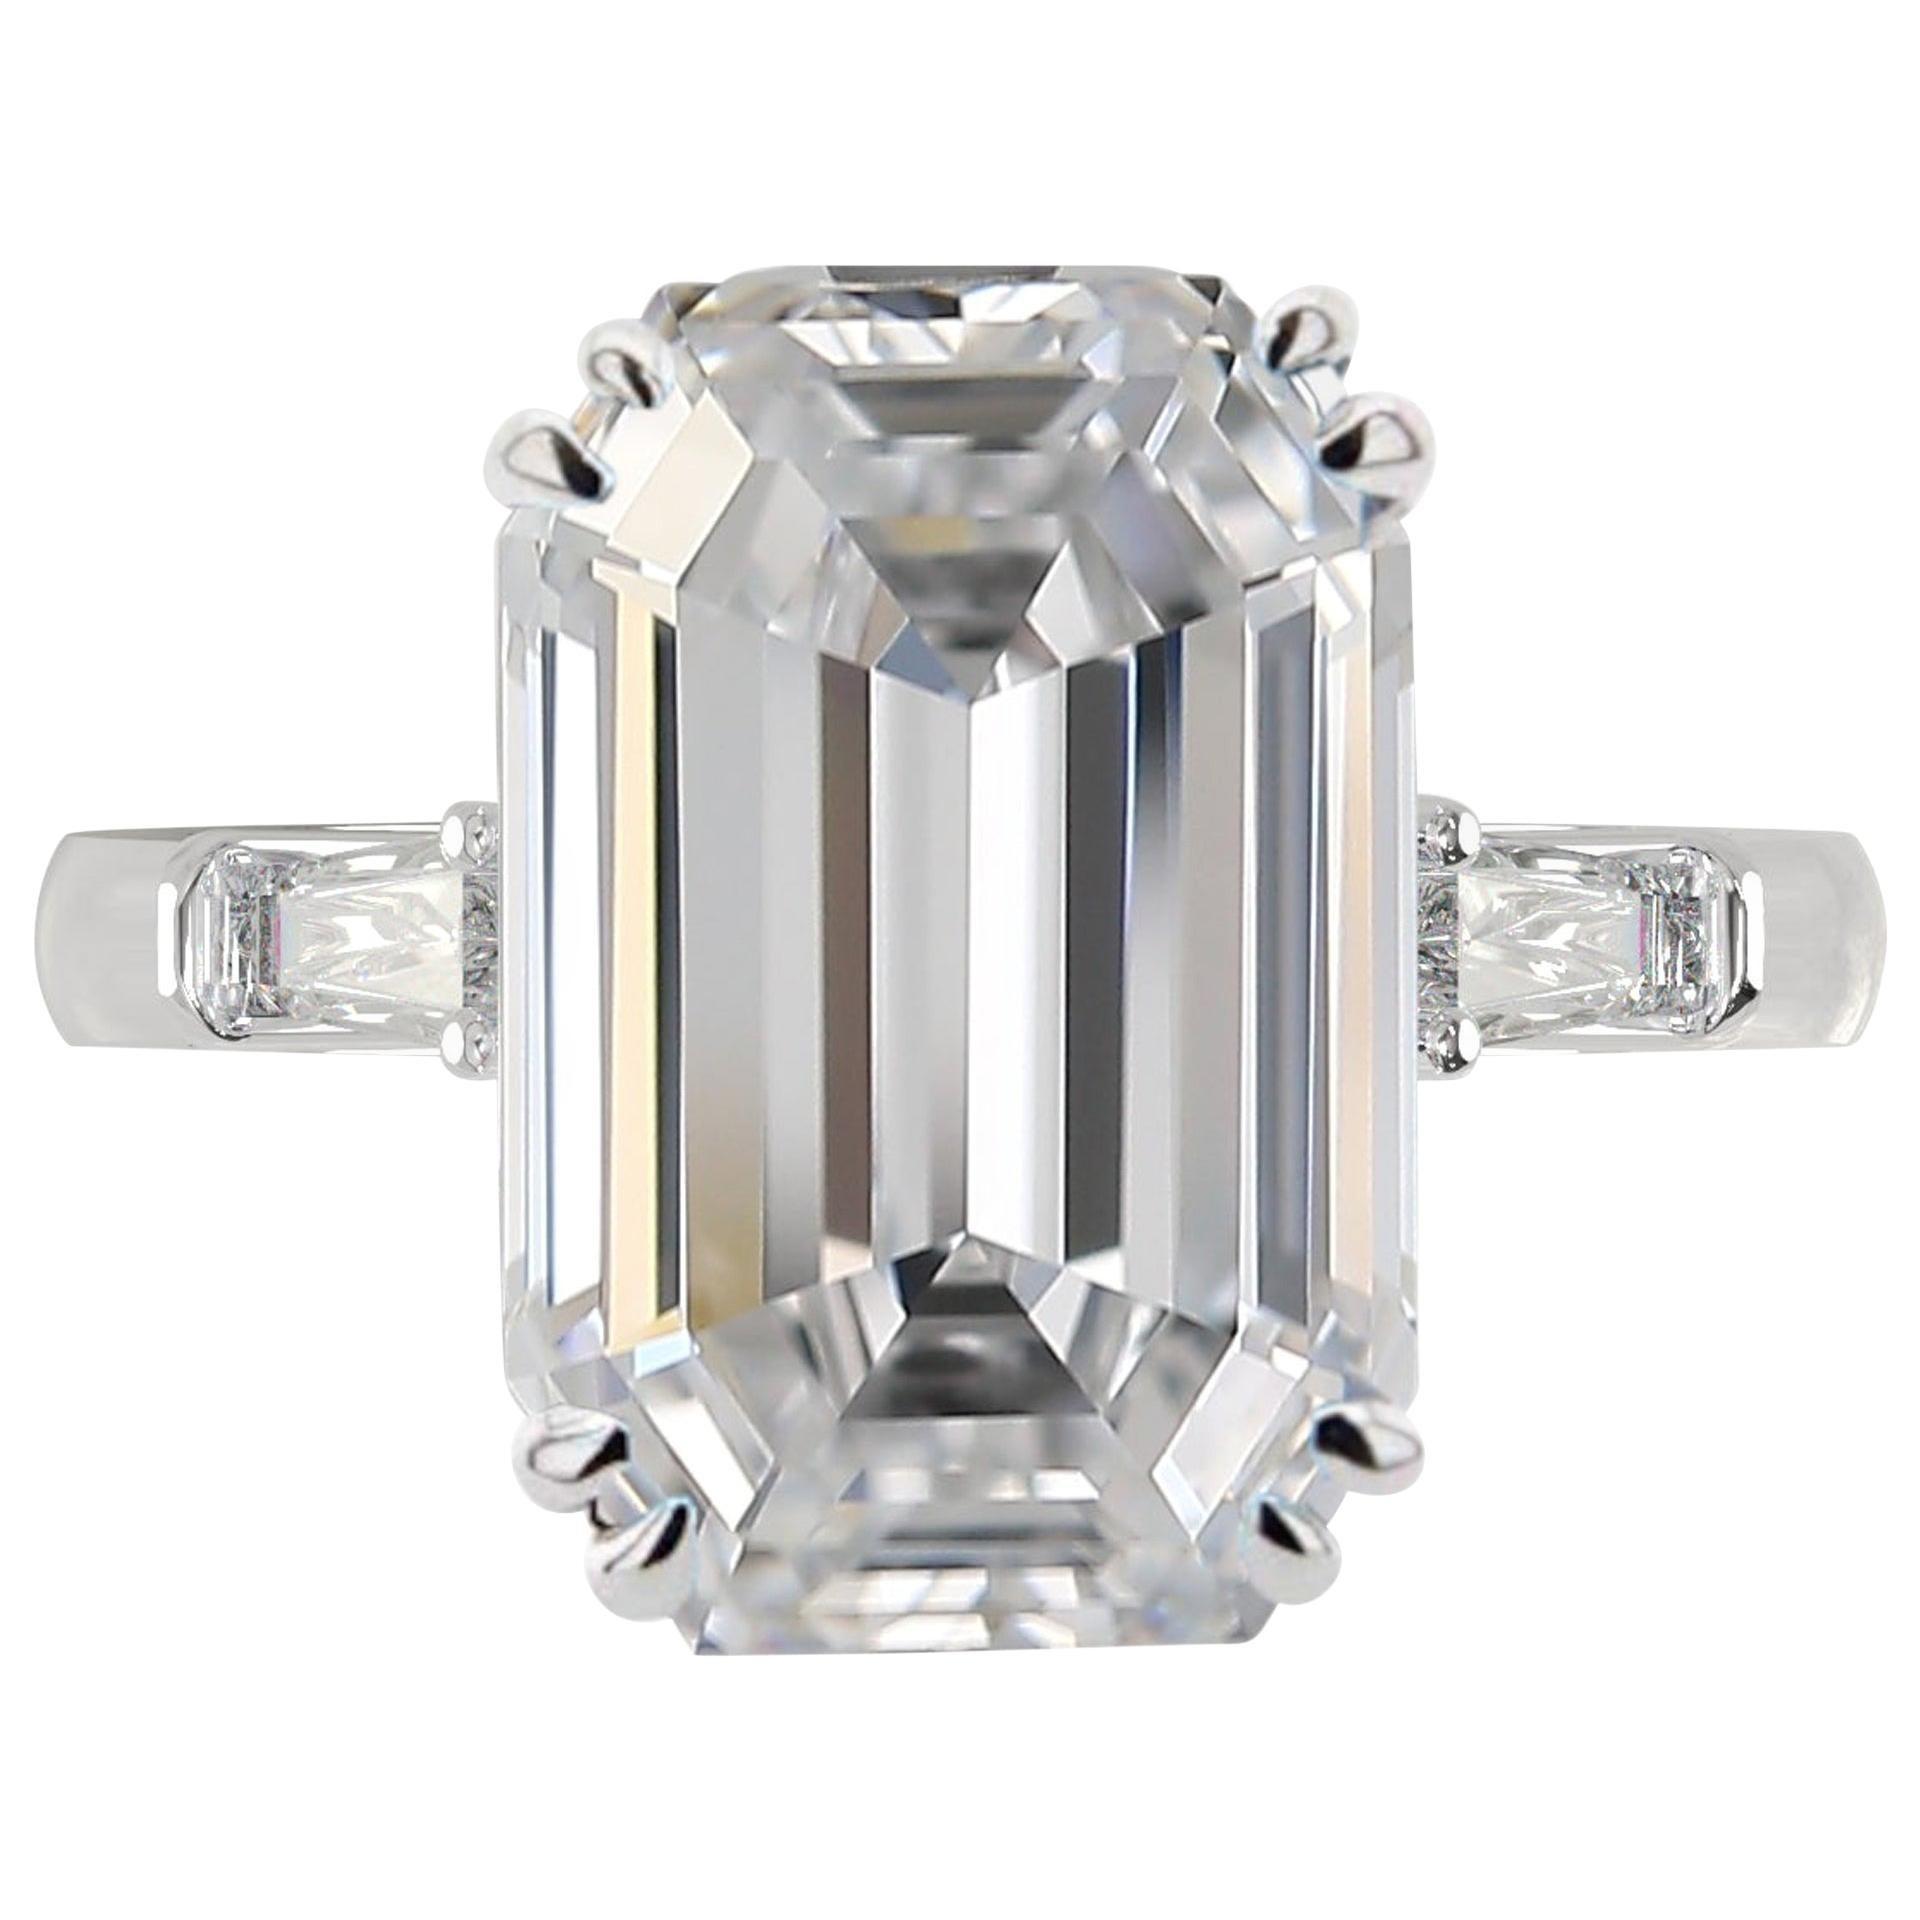 GIA Certified 3.50 Carat Emerald-Cut Diamond Ring D Color VS2 Clarity